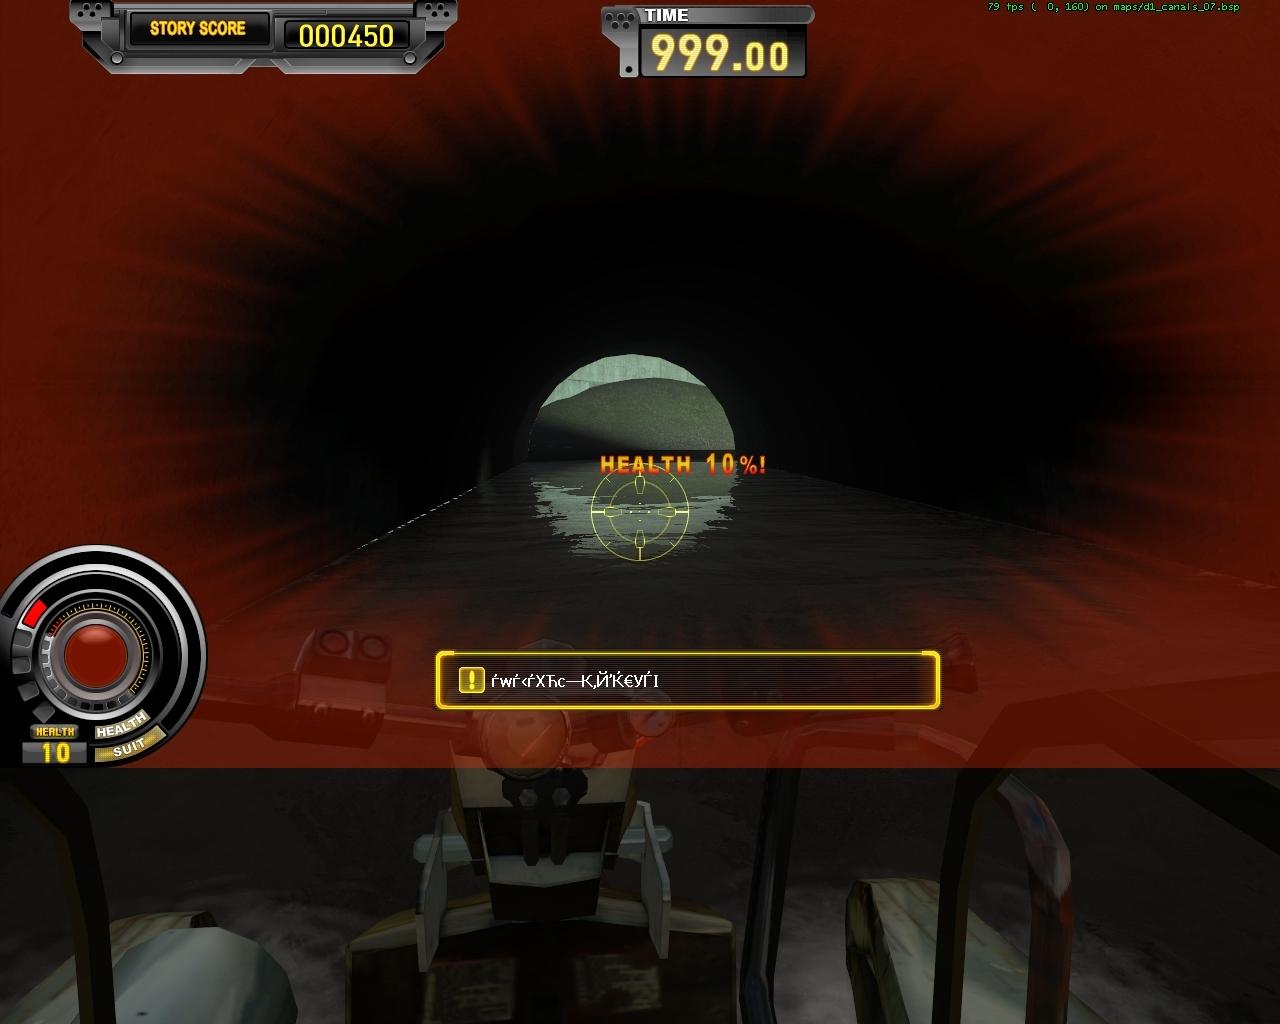 d1_canals_070019.jpg - Half-Life 2 Half-Life 2 Survivor, HL2Survivor